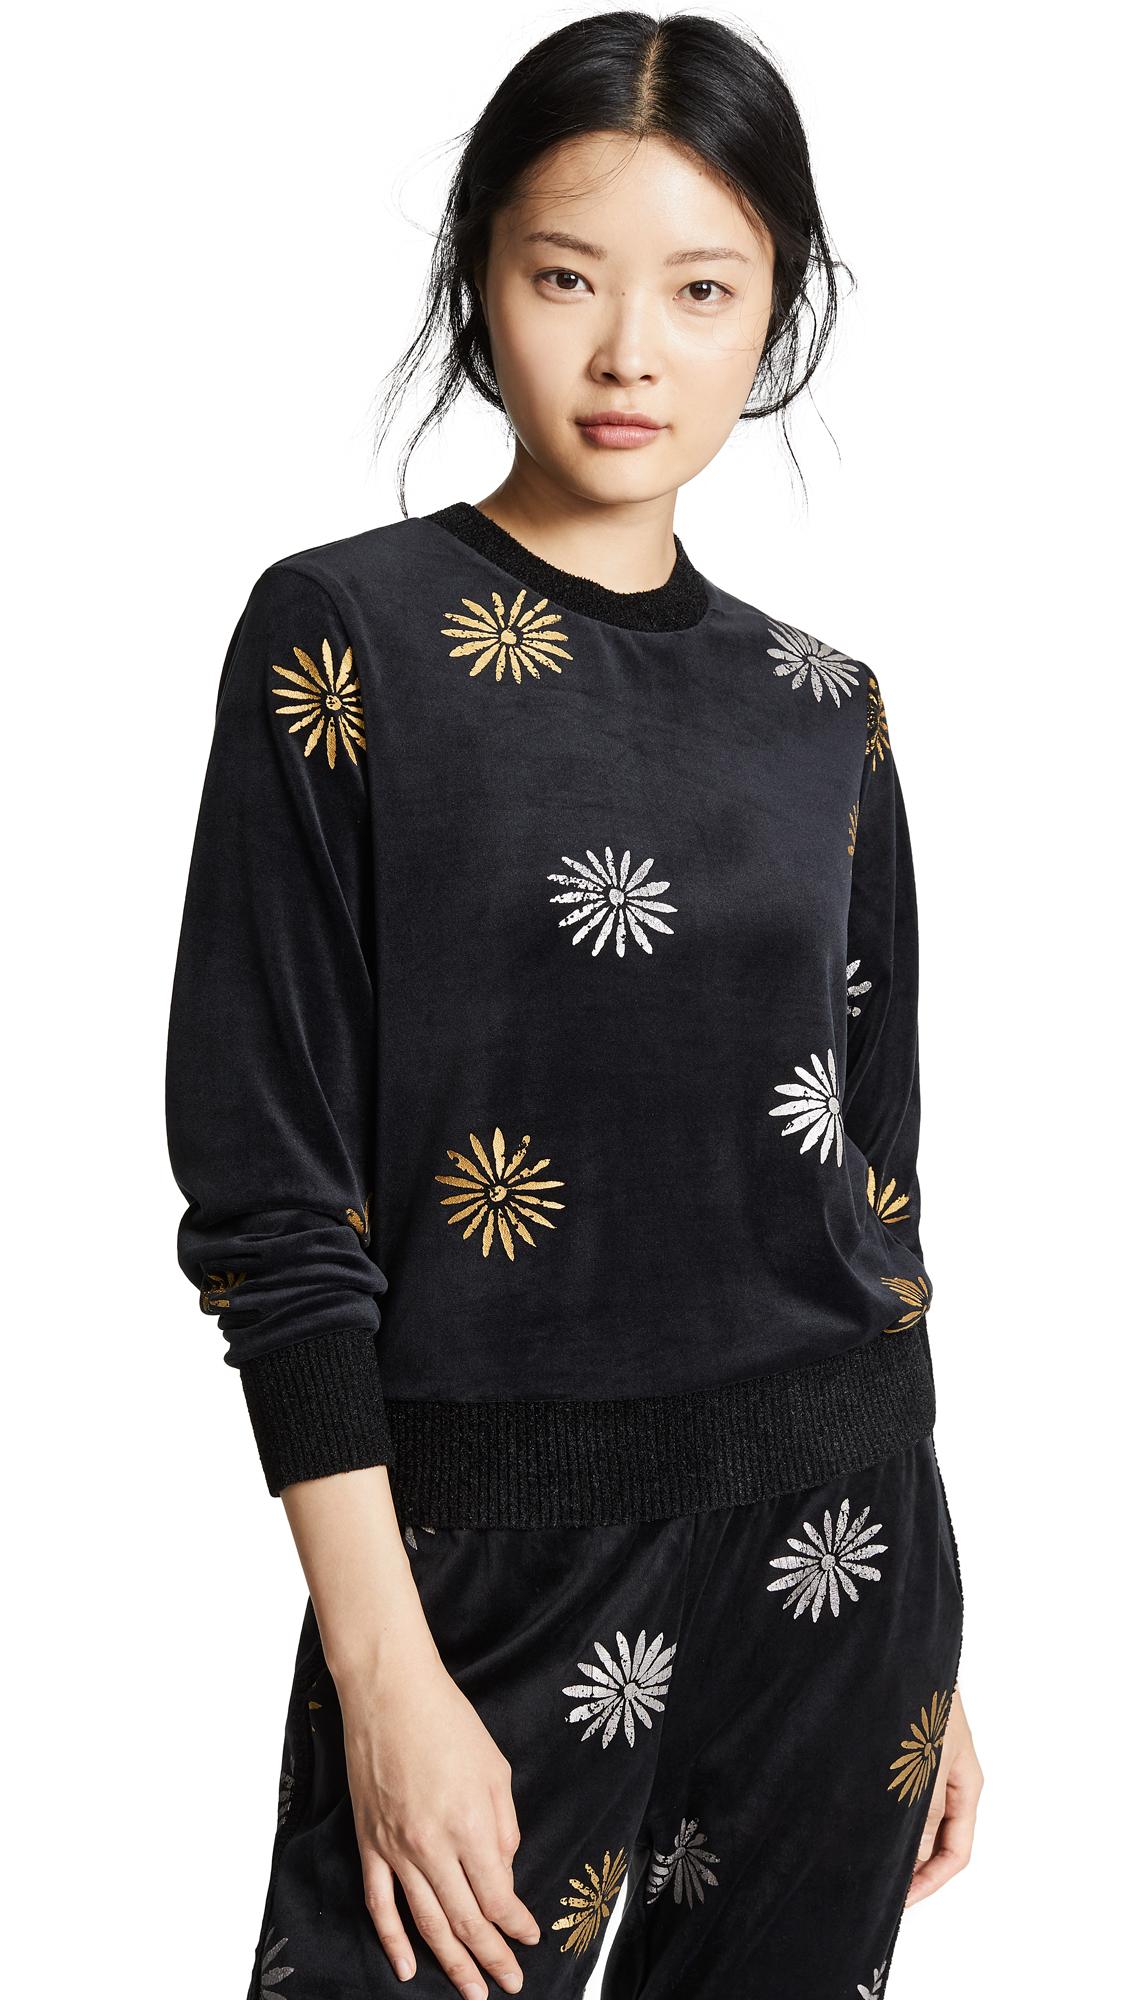 Splendid x Margherita Velutto Daisy Sweatshirt - Nero